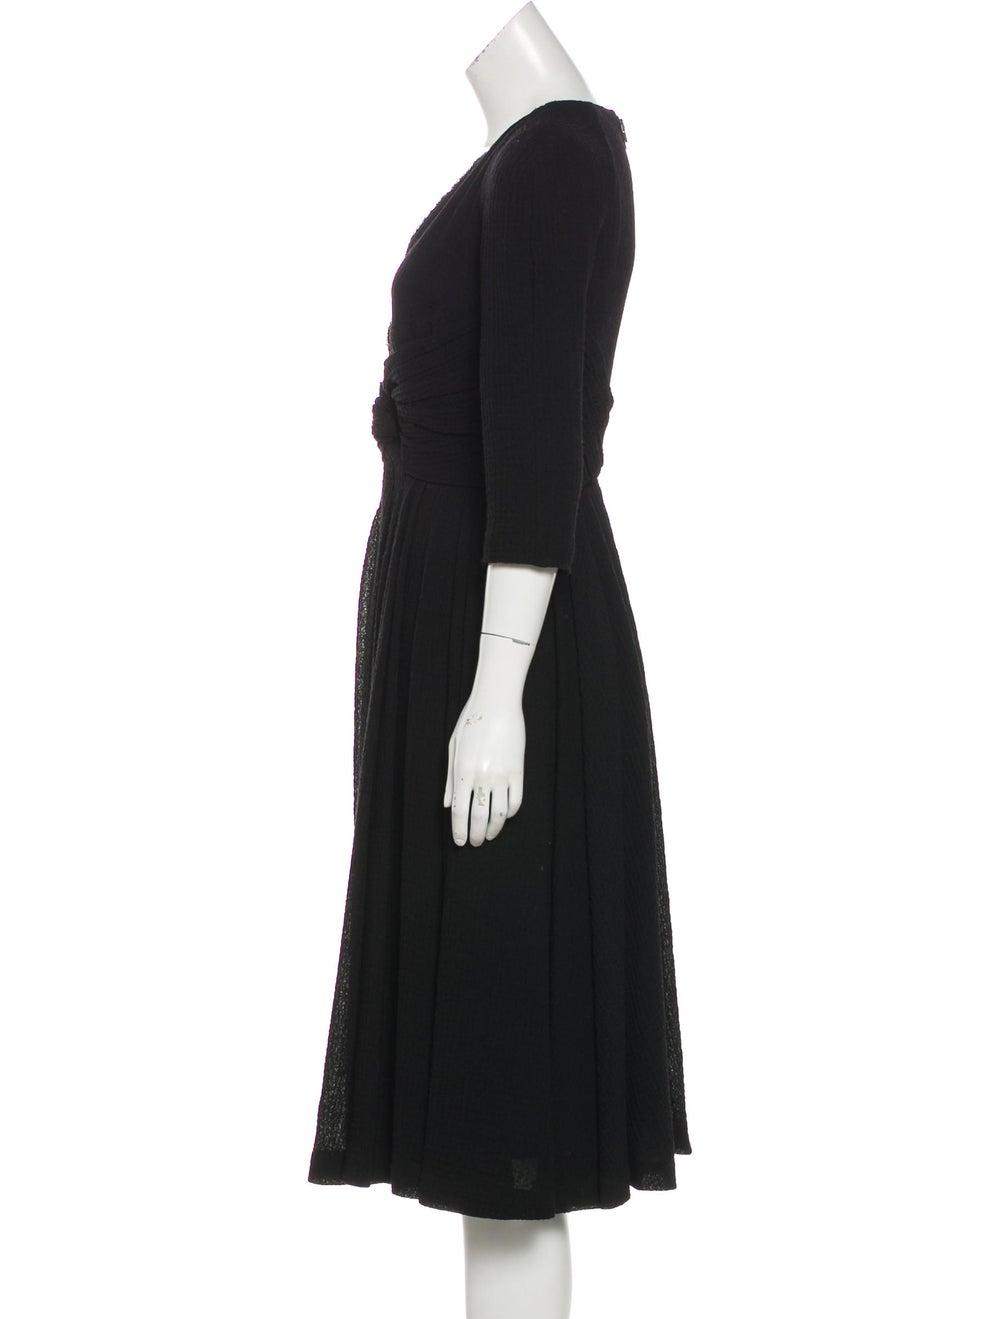 Burberry Wool Seersucker Dress Black - image 2